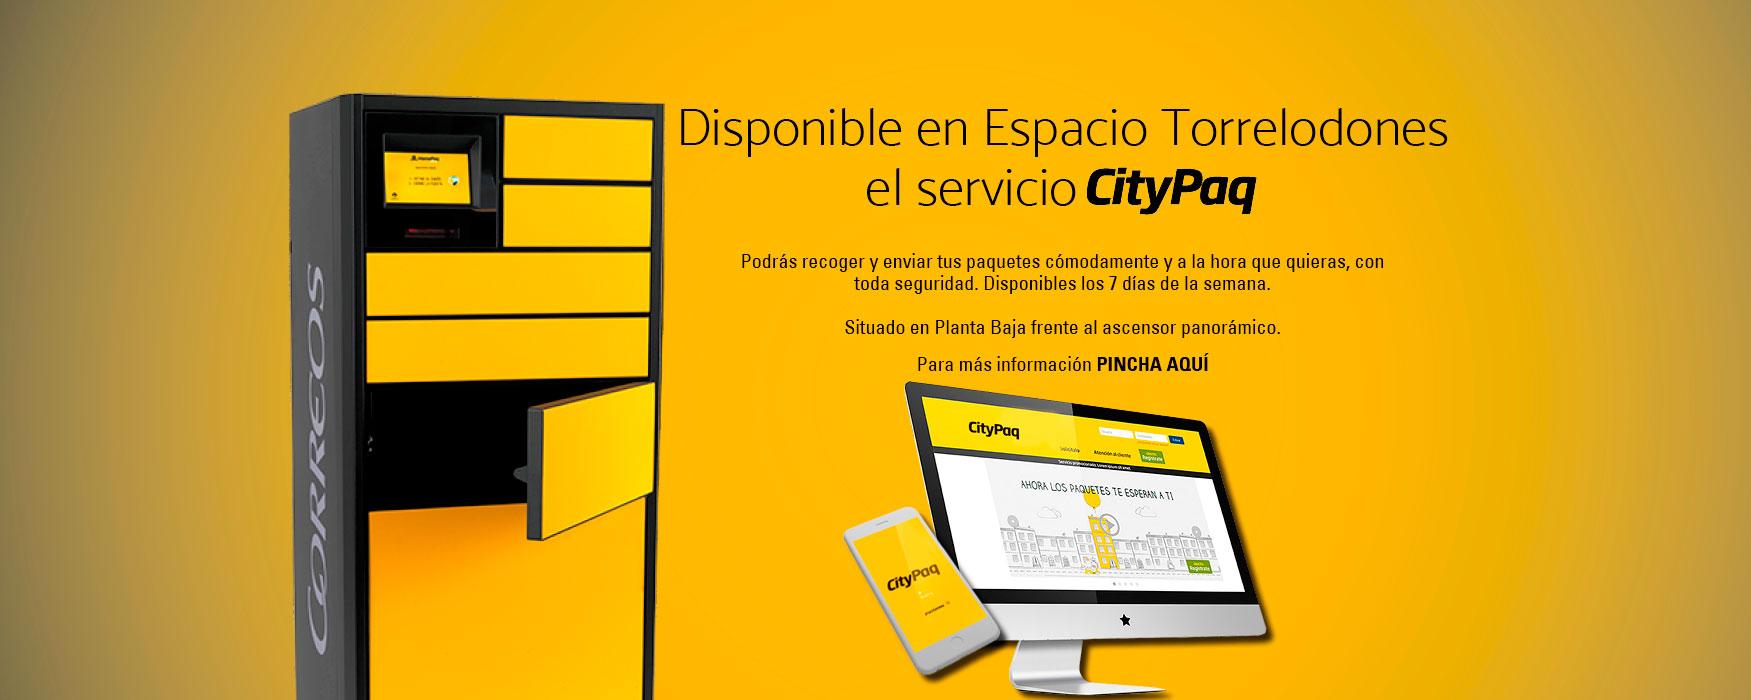 Cabecera-web-CityPaq-Espacio